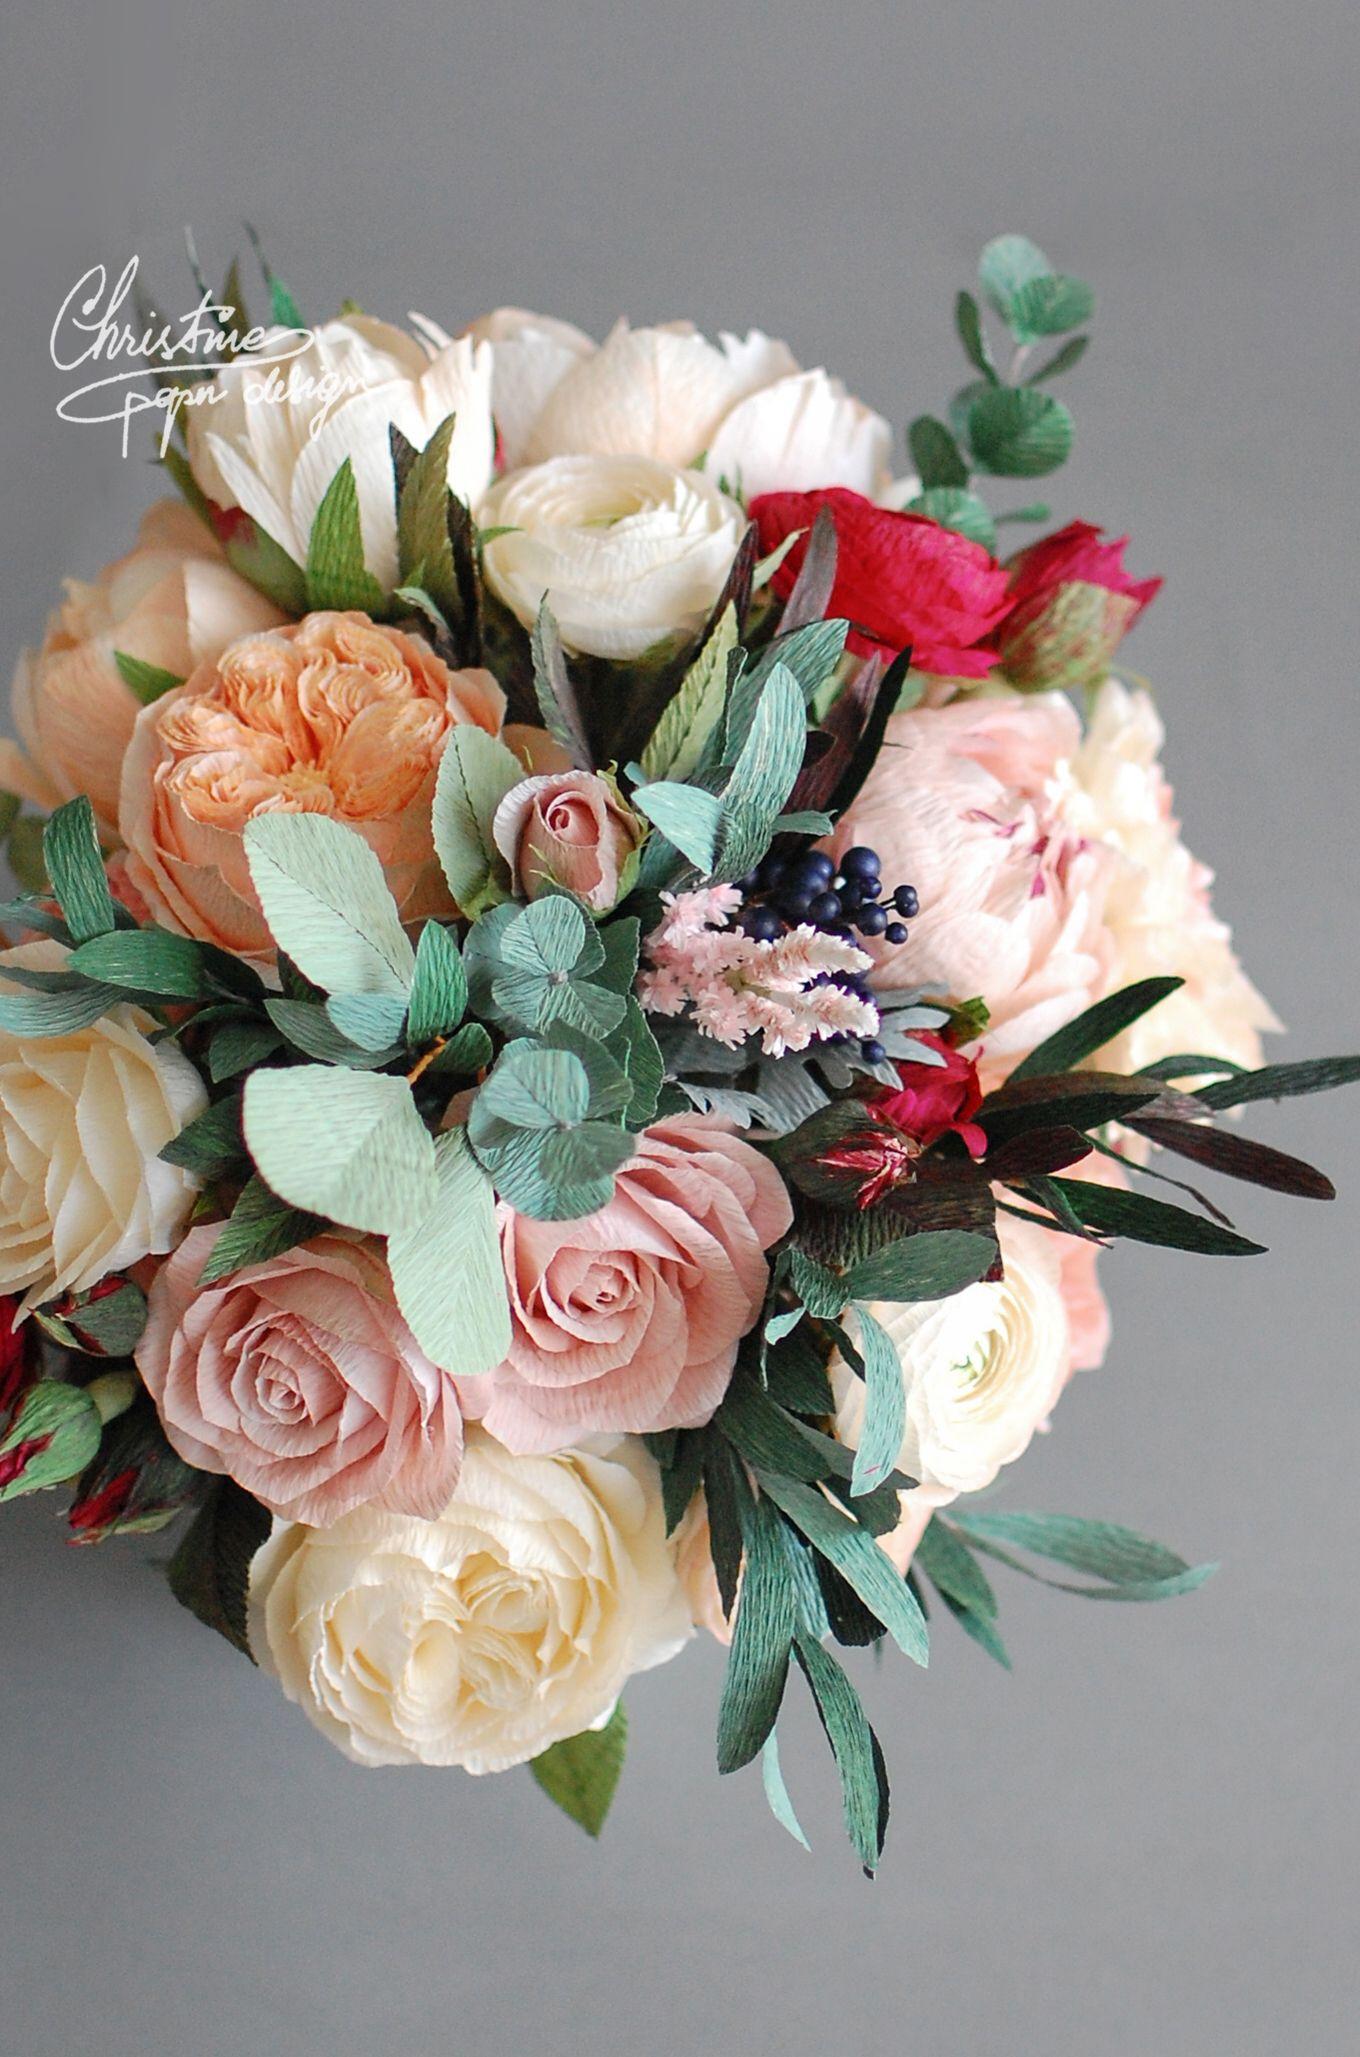 Paperflowers Bridal Bouquet Christinepaperdesign 2 Paper